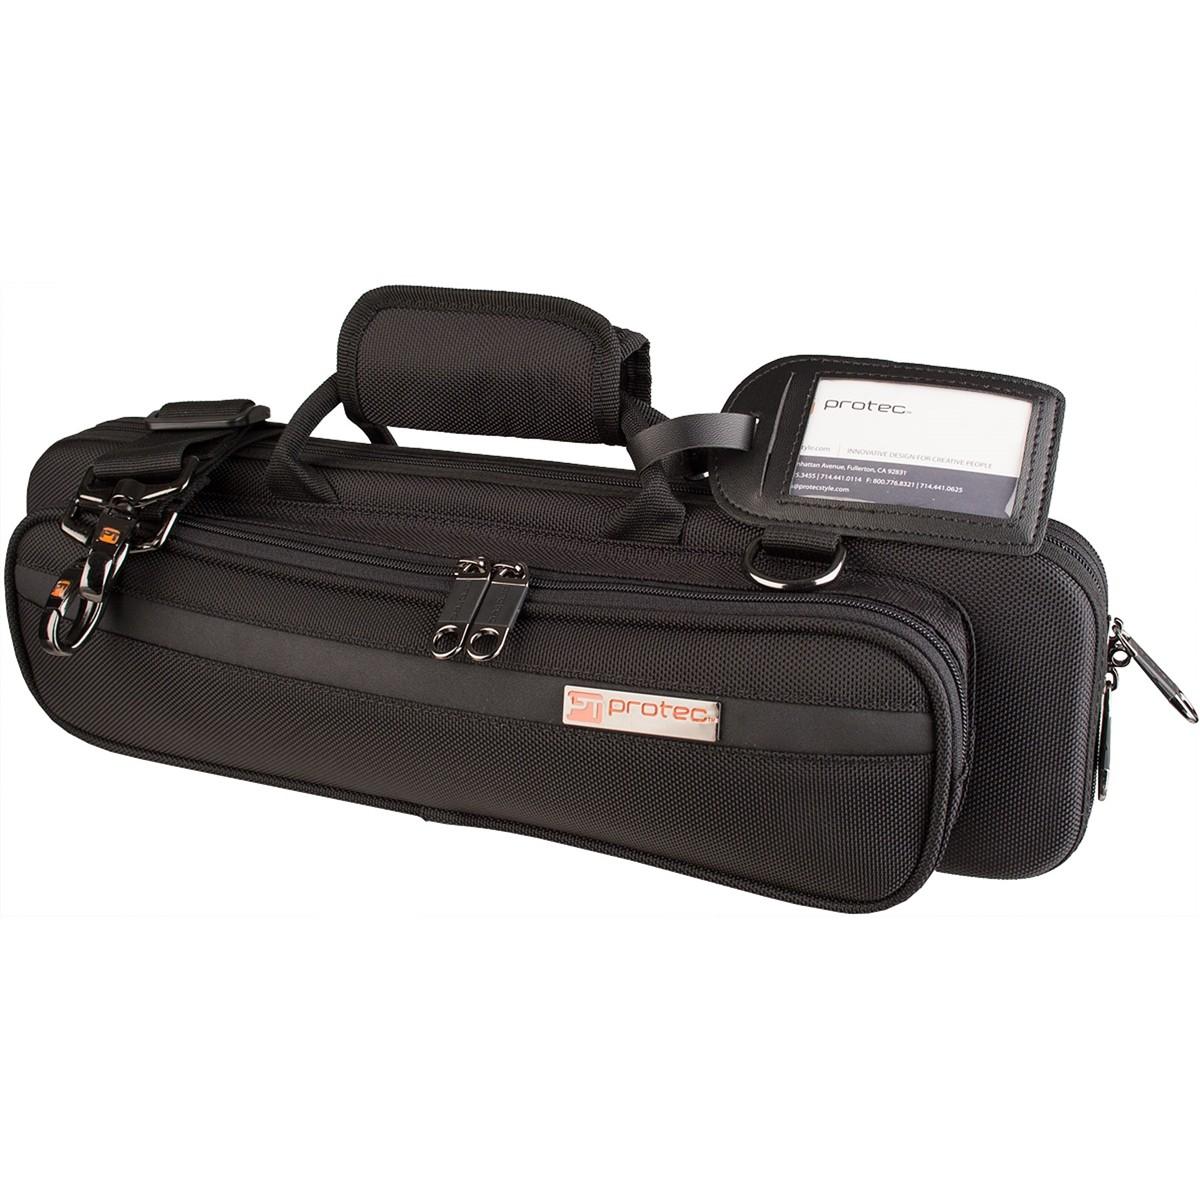 Protec Flute PRO PAC Case - Slimline  (PB308)